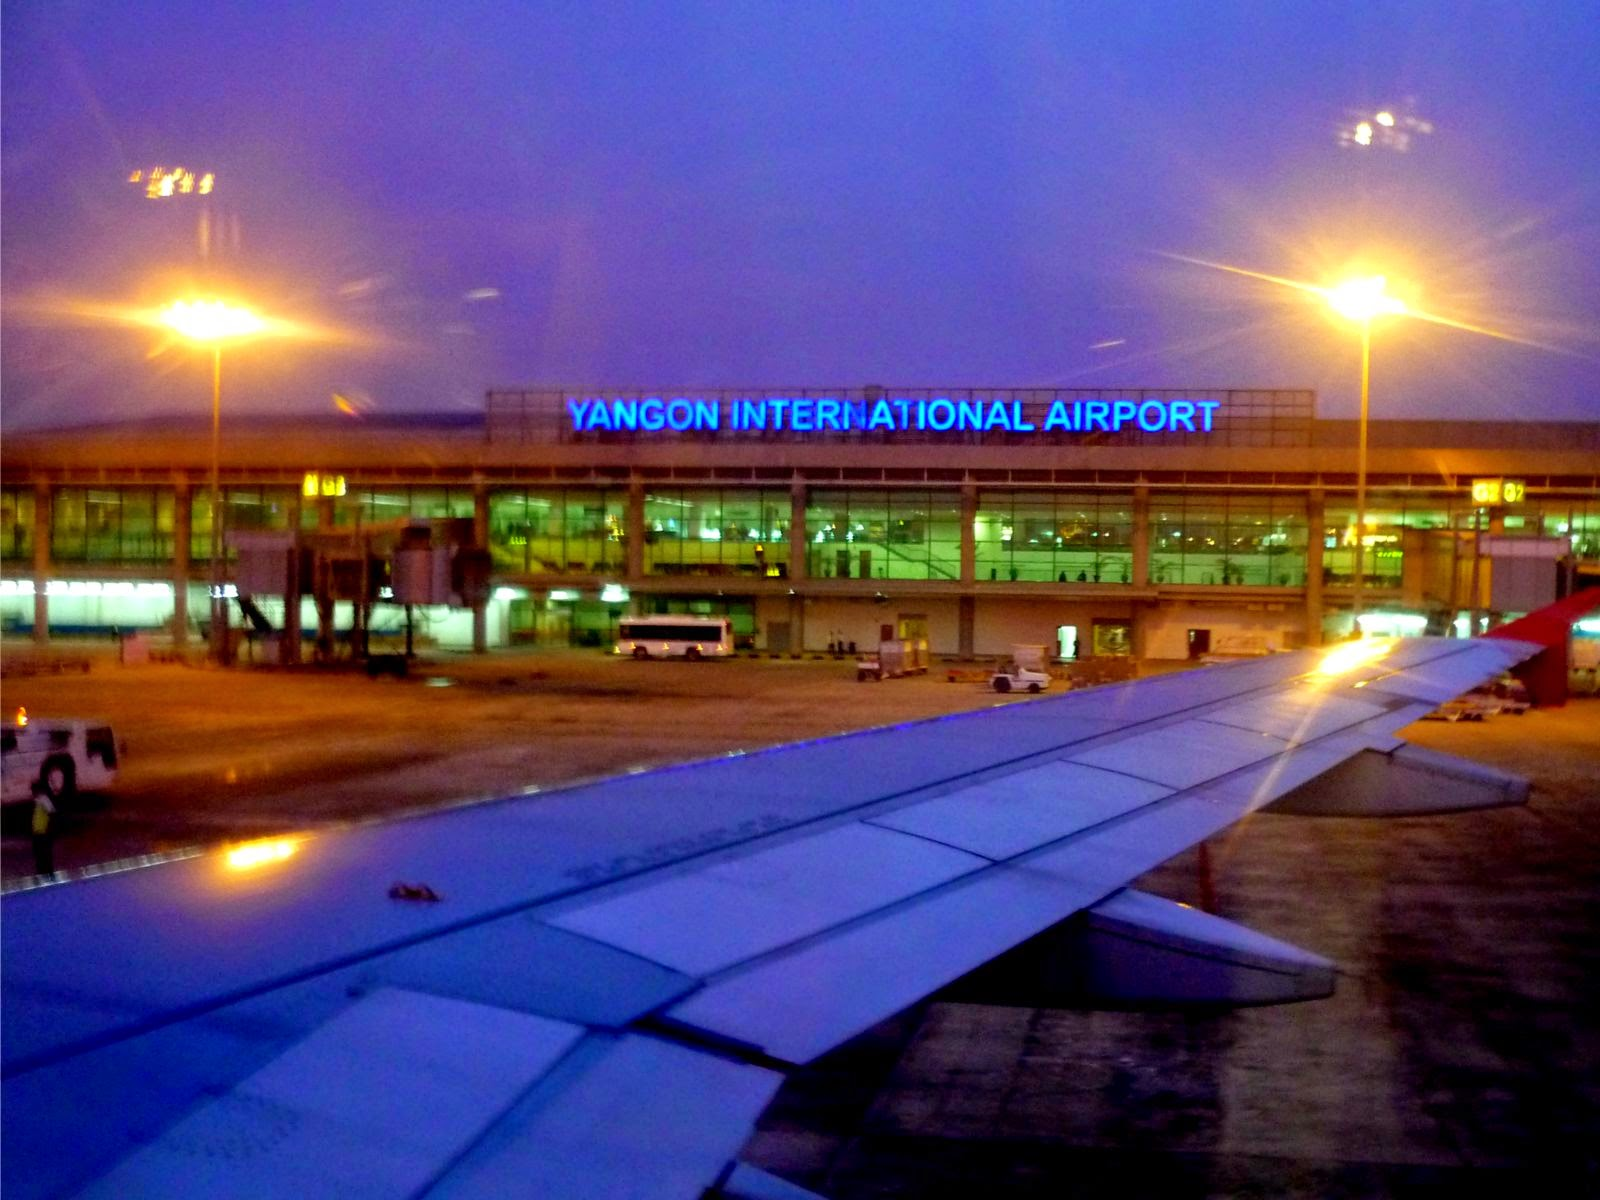 Yangon International Airport | World Travel Guide